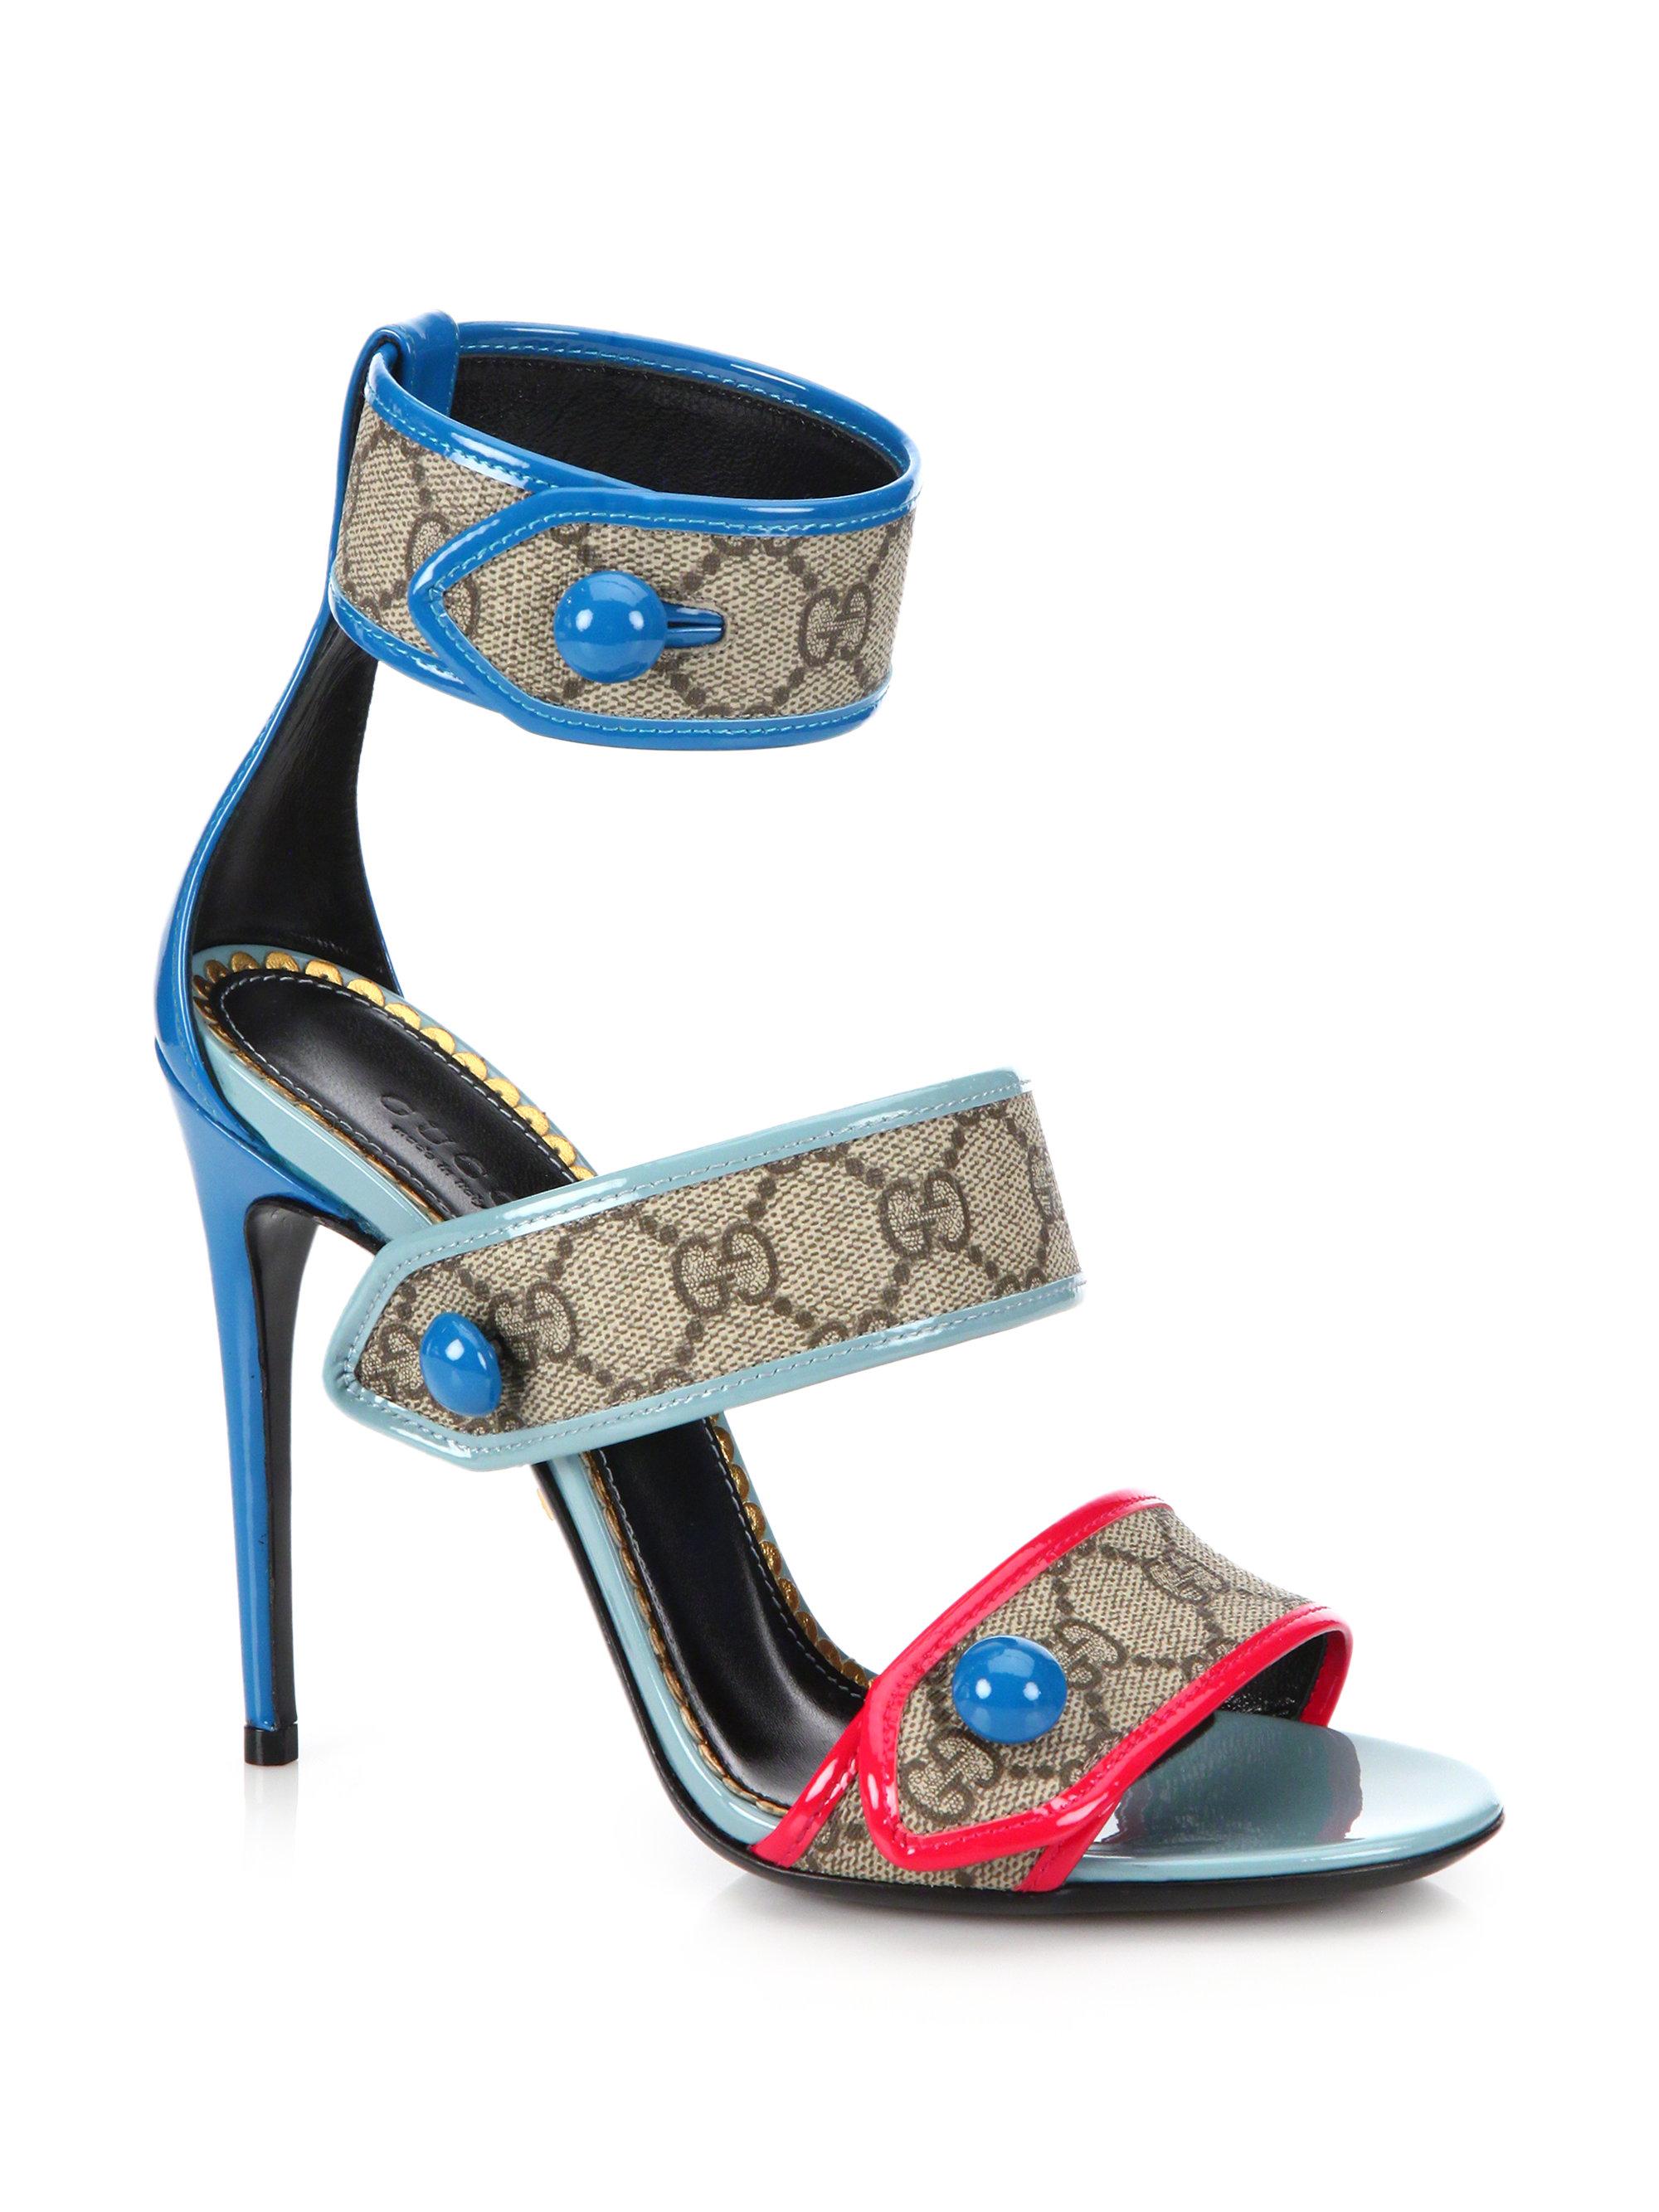 9972f6e58cada Gucci Harleth GG Patent-Leather Sandals - Lyst